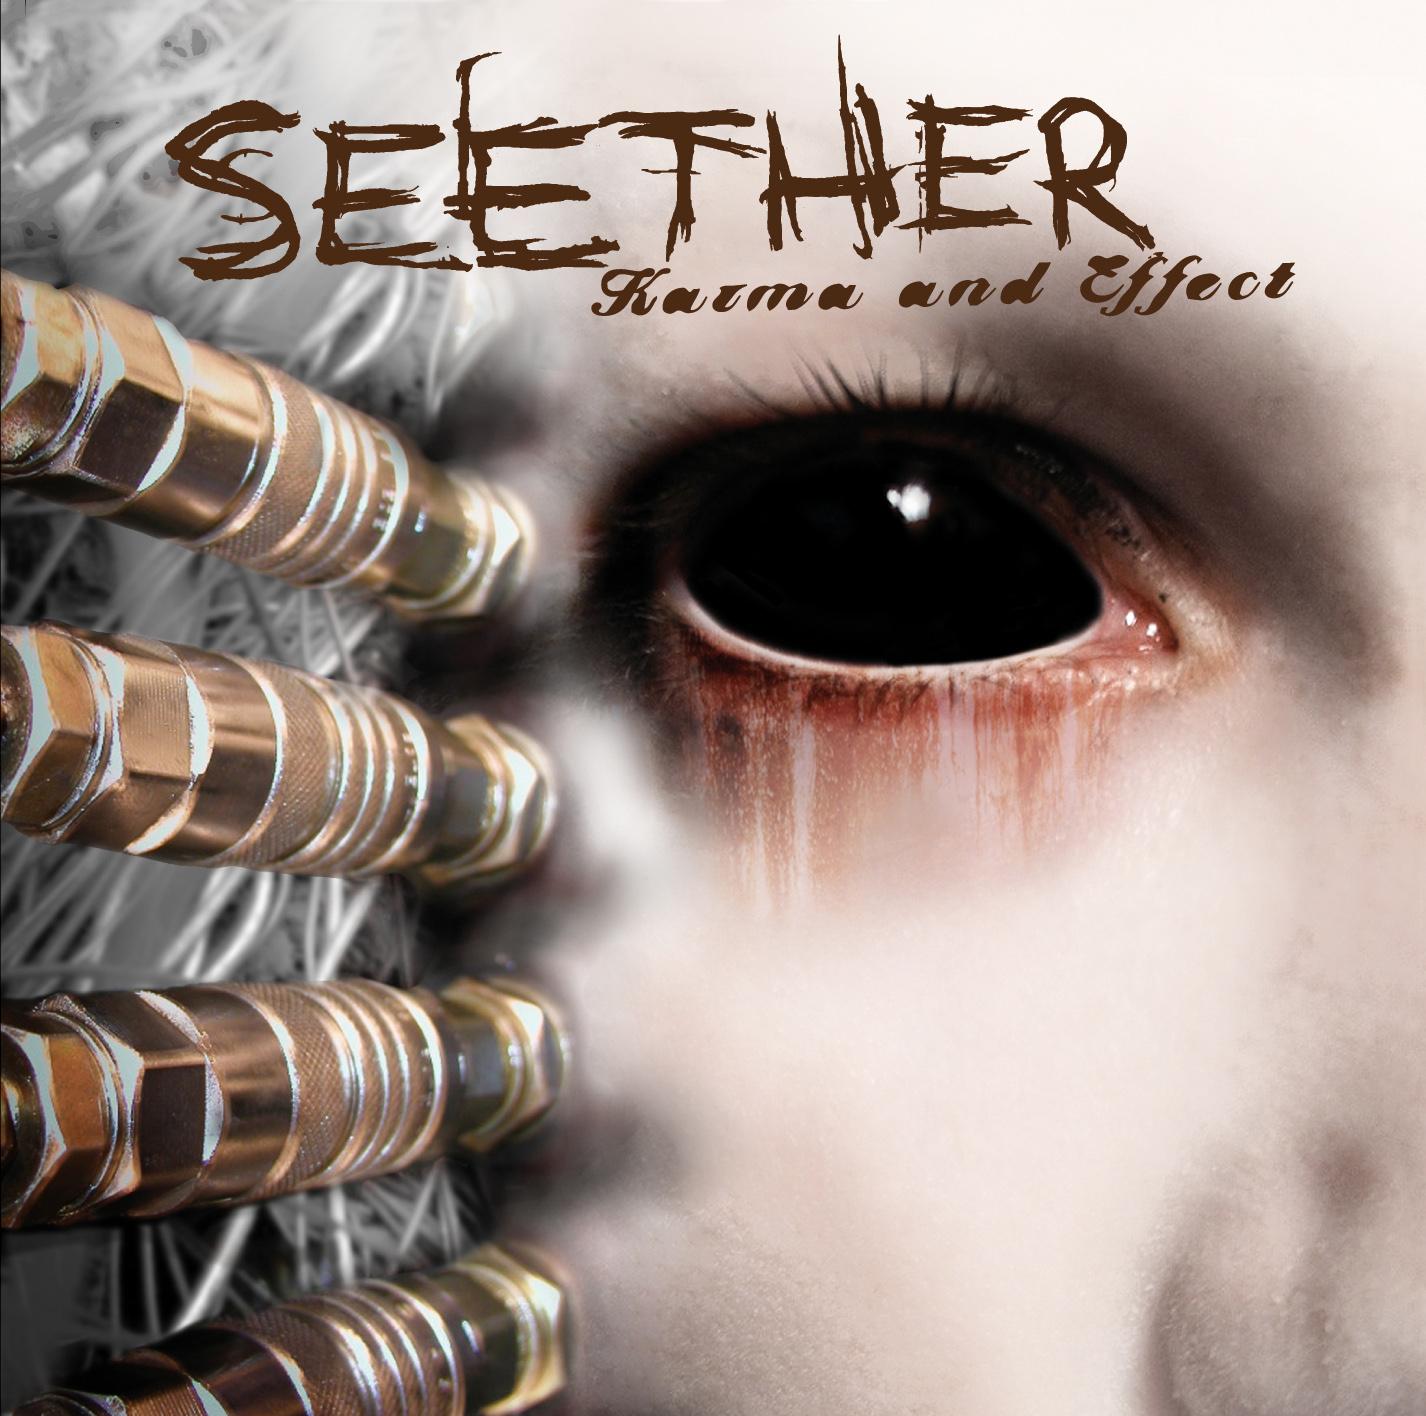 seether karma and effect 2005.jpg